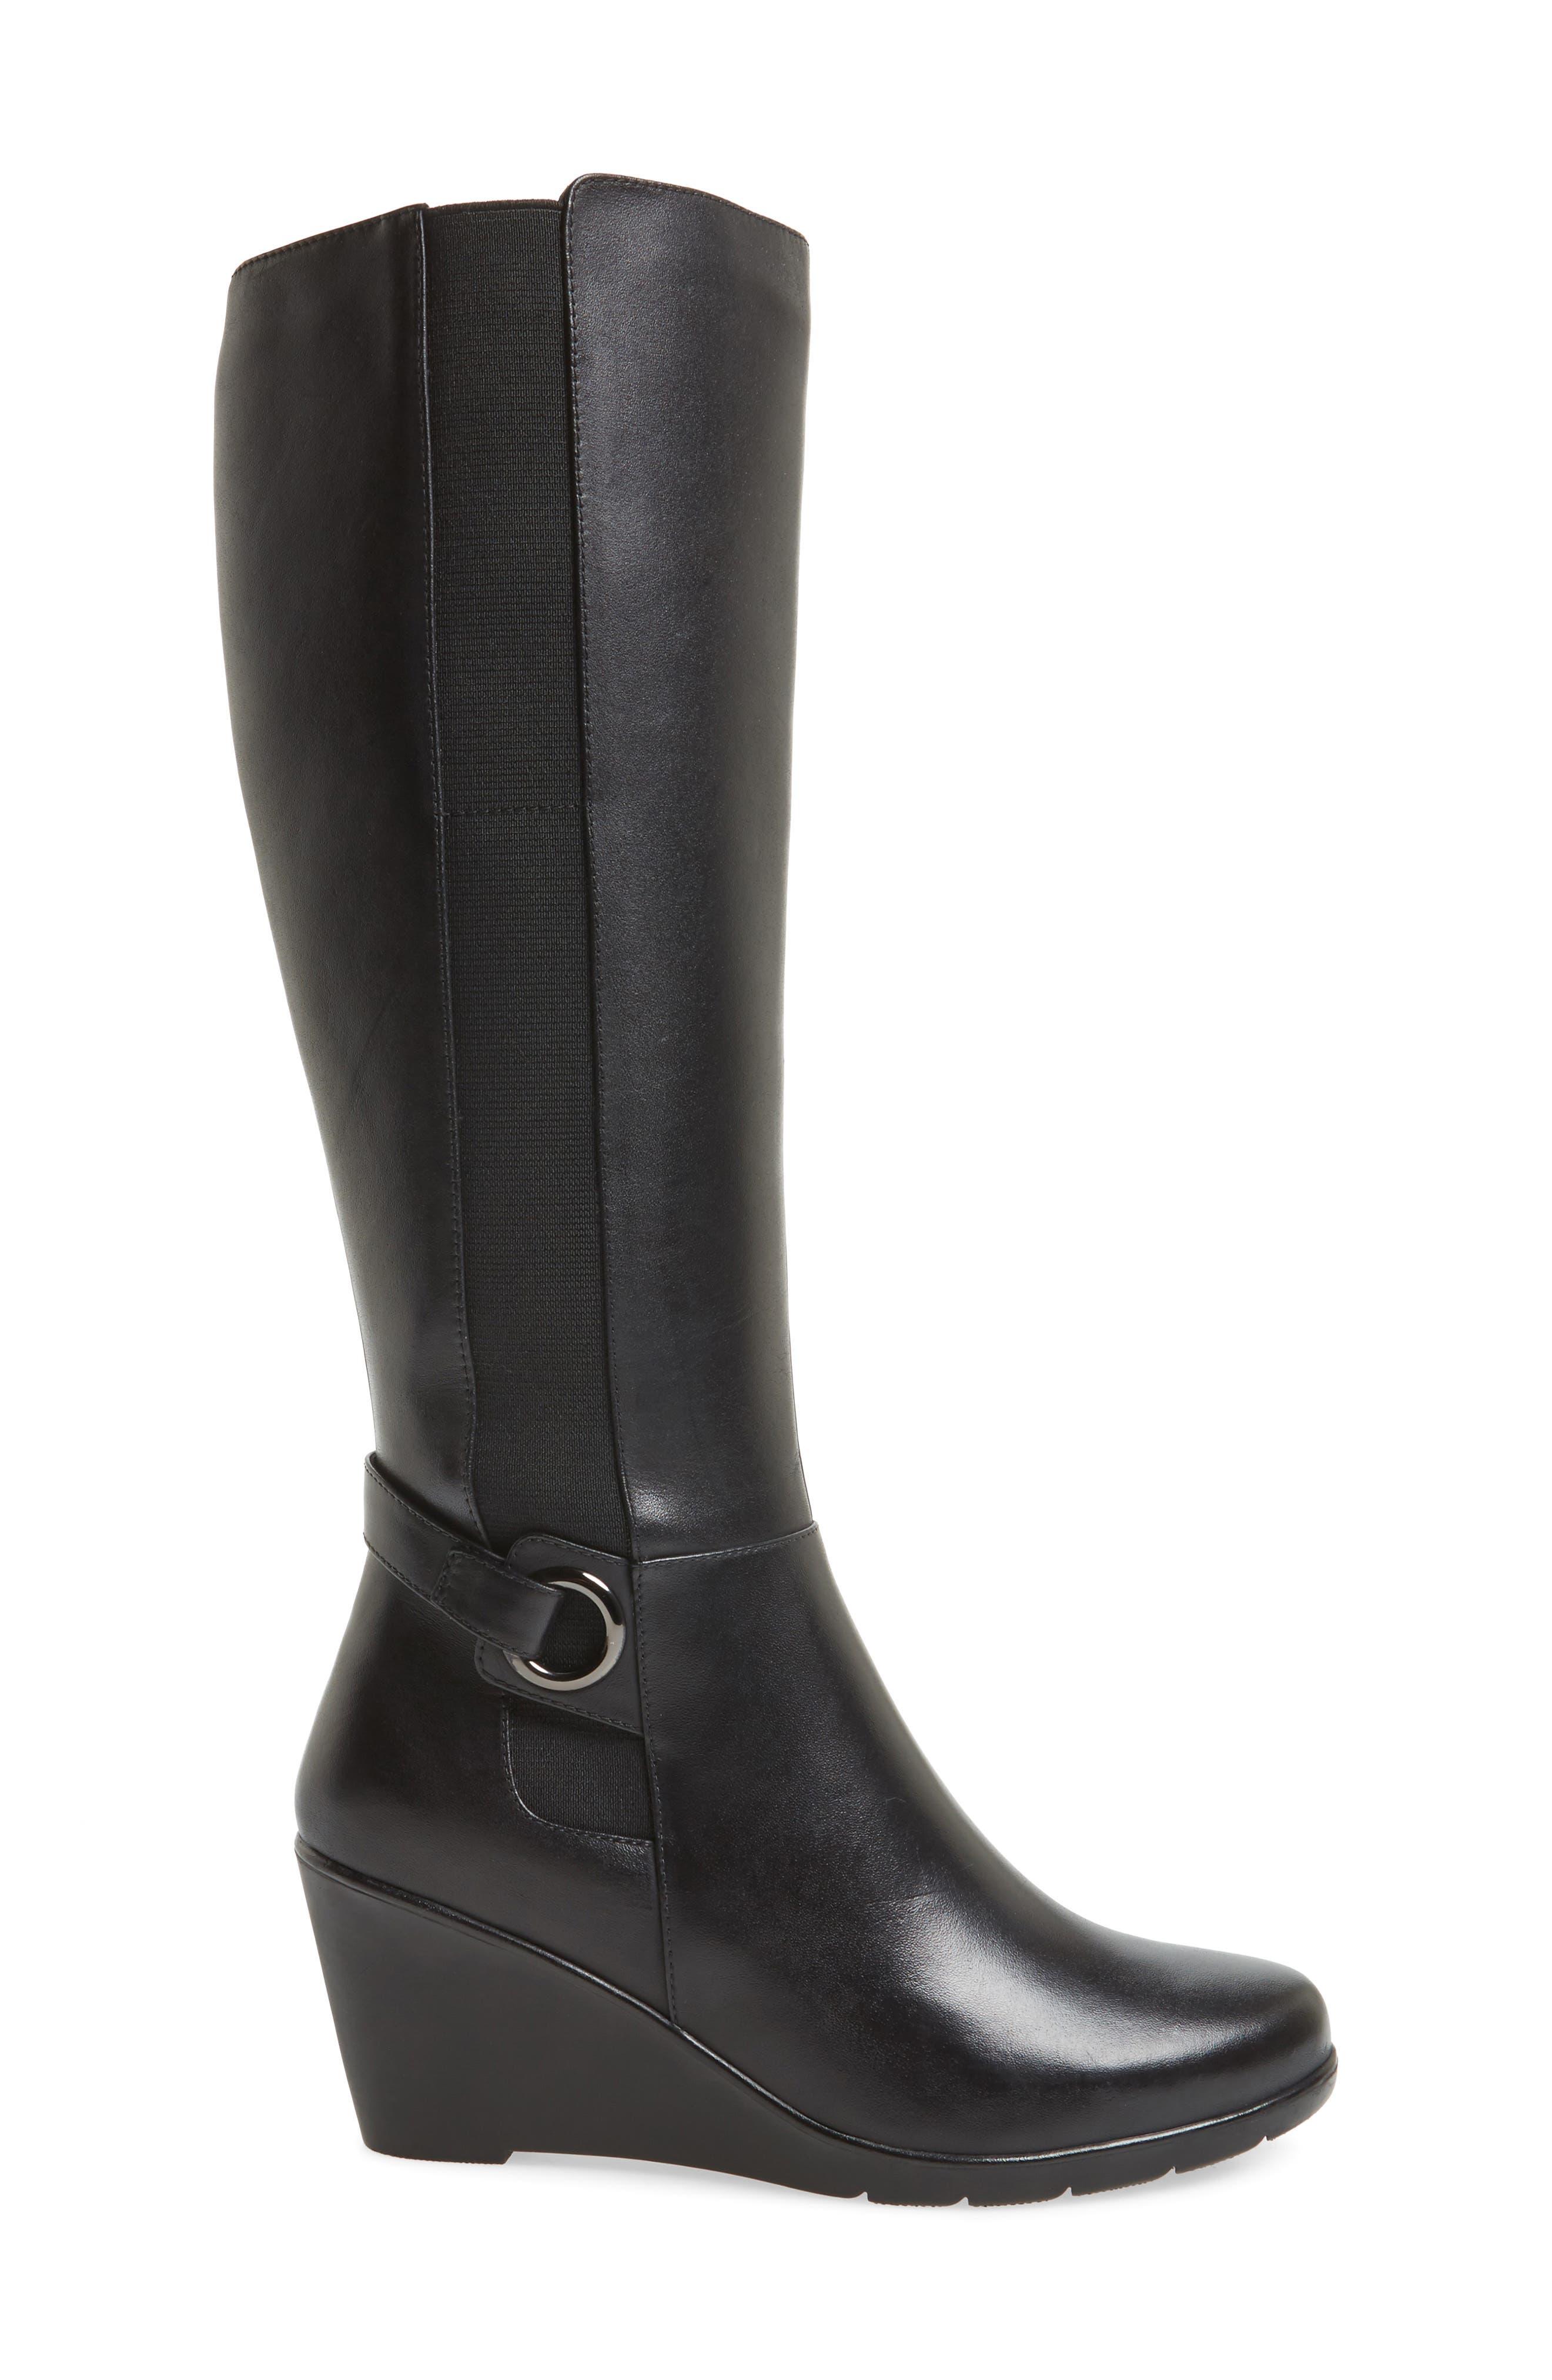 Lexie Waterproof Knee High Boot,                             Alternate thumbnail 3, color,                             001